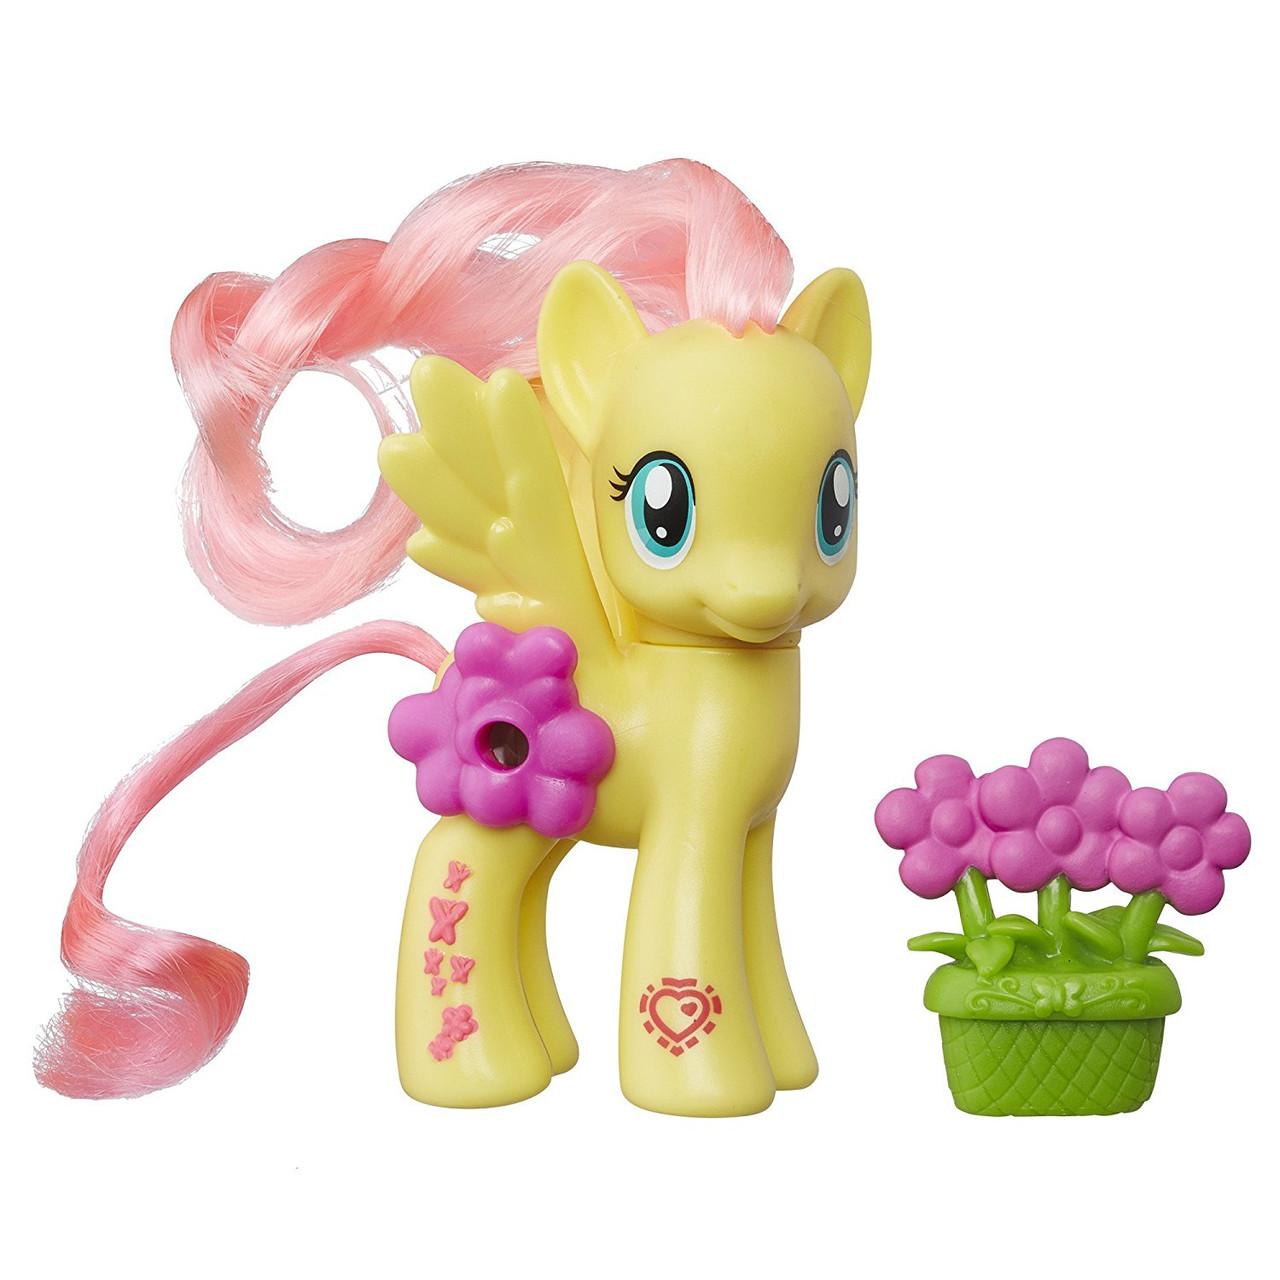 My Little Pony Игровой набор Пони с волшебными картинками Флаттершай Explore Equestria Magical Scenes Fluttershy